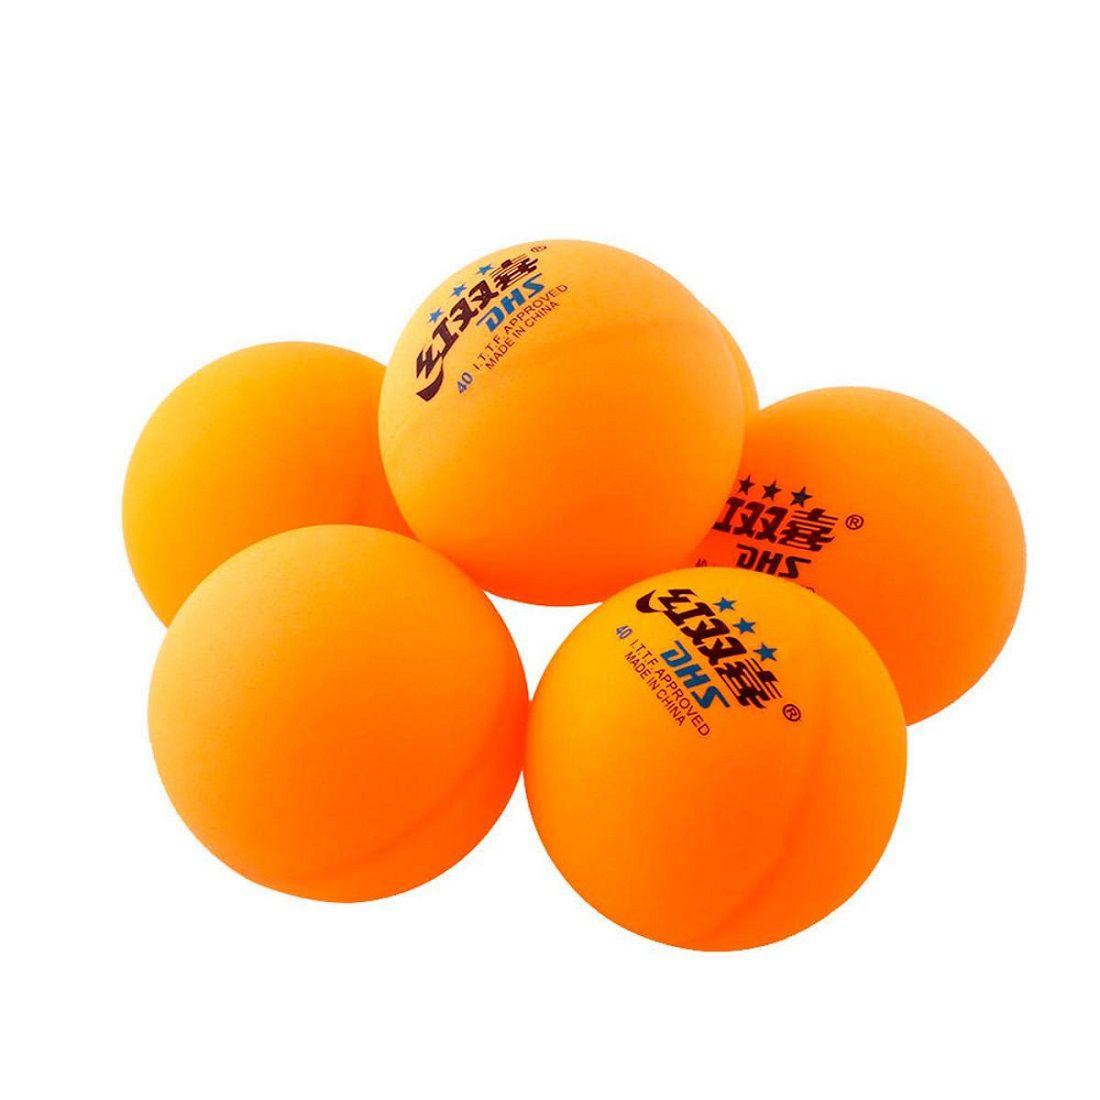 Bola Tênis de Mesa DHS 1 Star T.T. Ball 10 Unidades